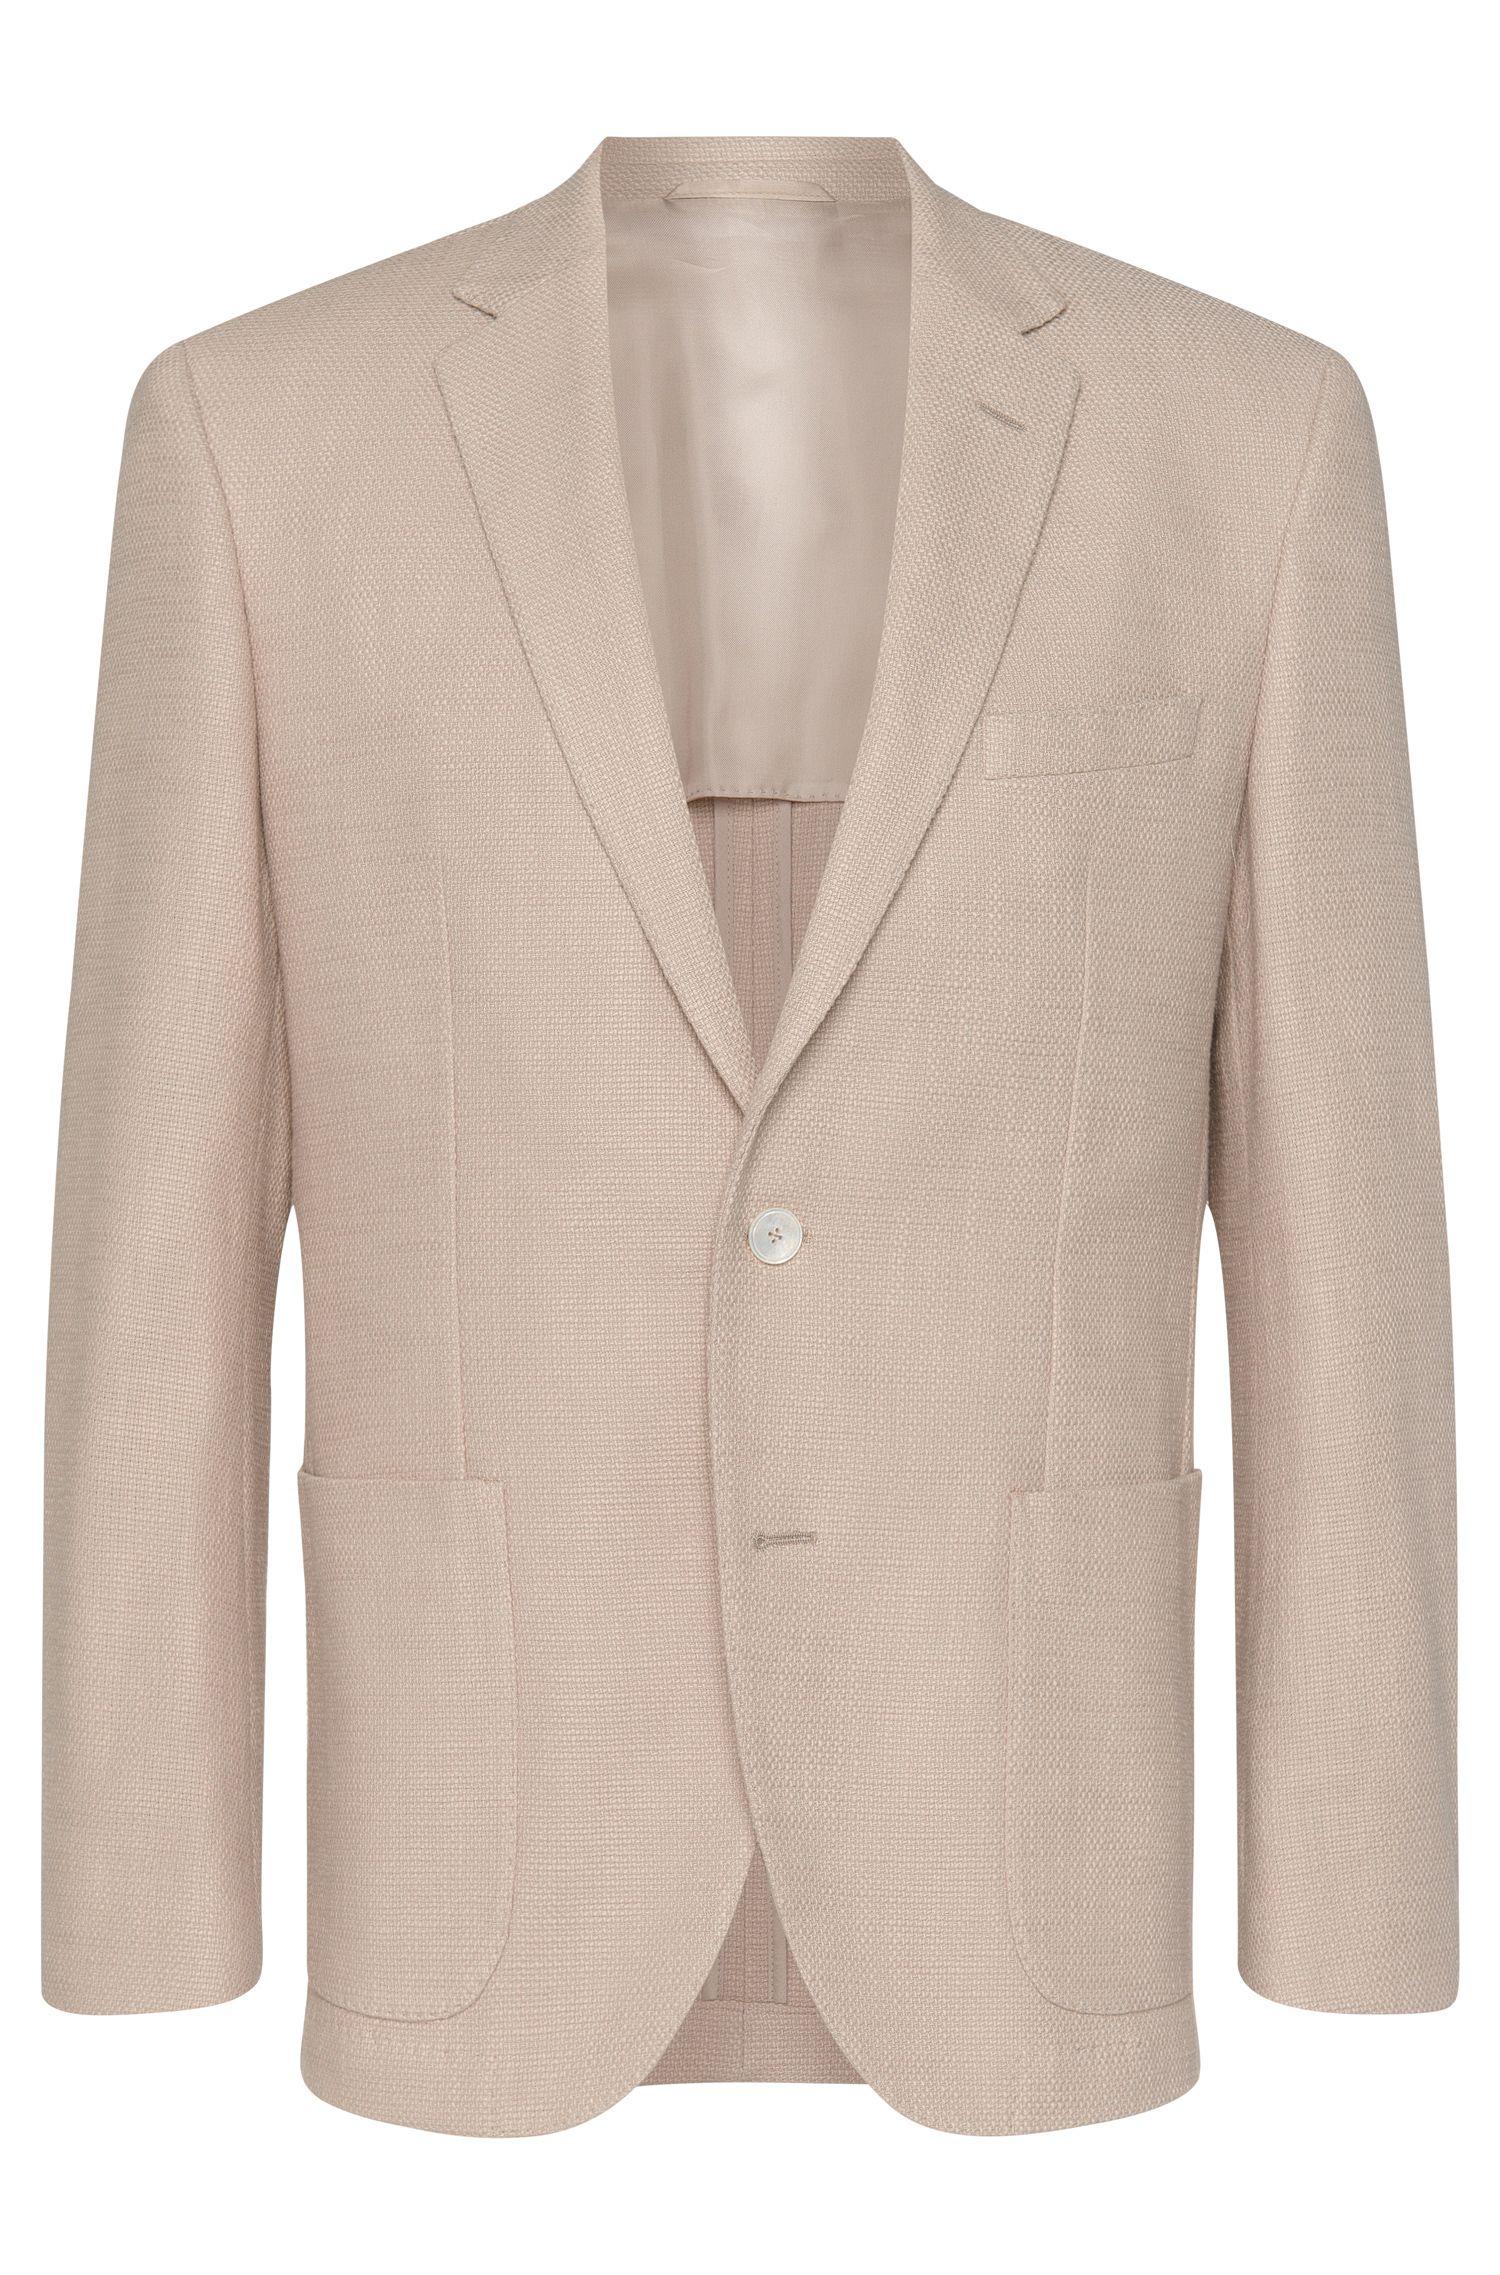 'Janson' | Regular Fit, Cotton Textured Sport Coat